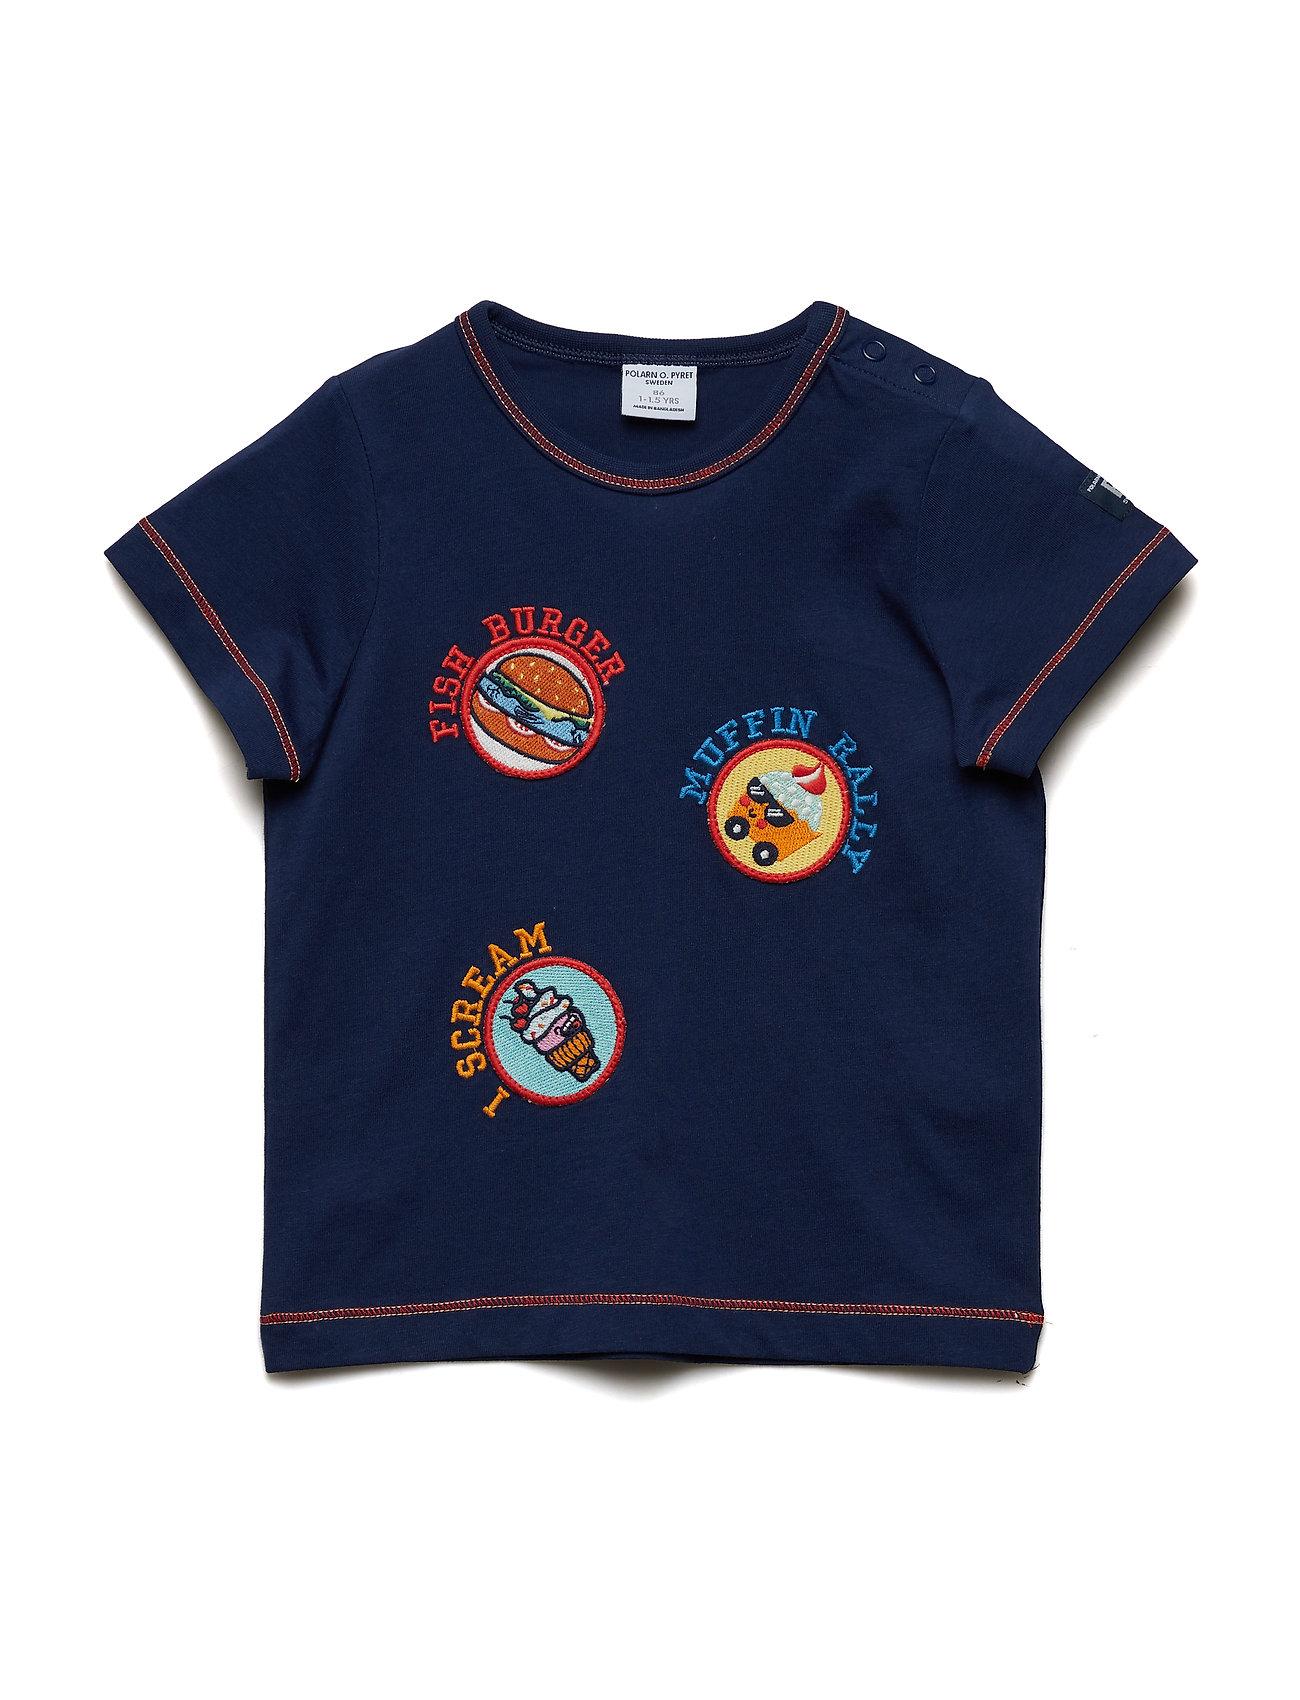 Polarn O. Pyret T-shirt S/S Preschool - MEDIEVAL BLUE